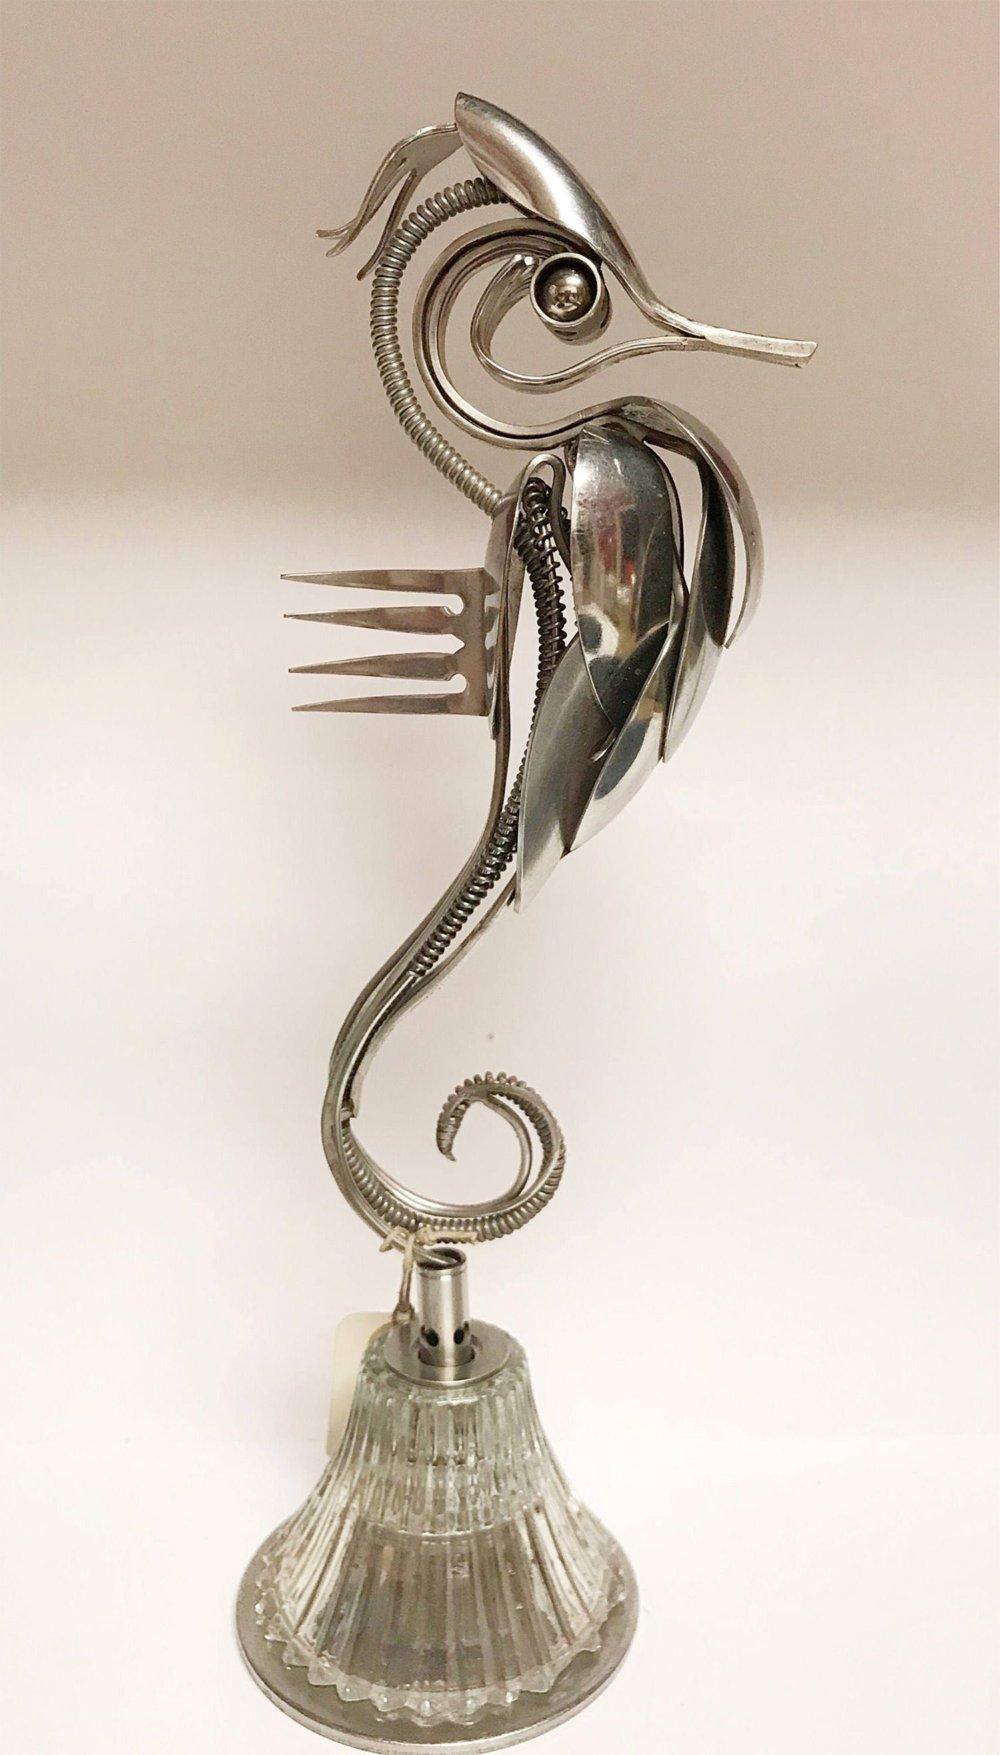 Incredible Silverware Animal Sculptures By Matt Wilson 5